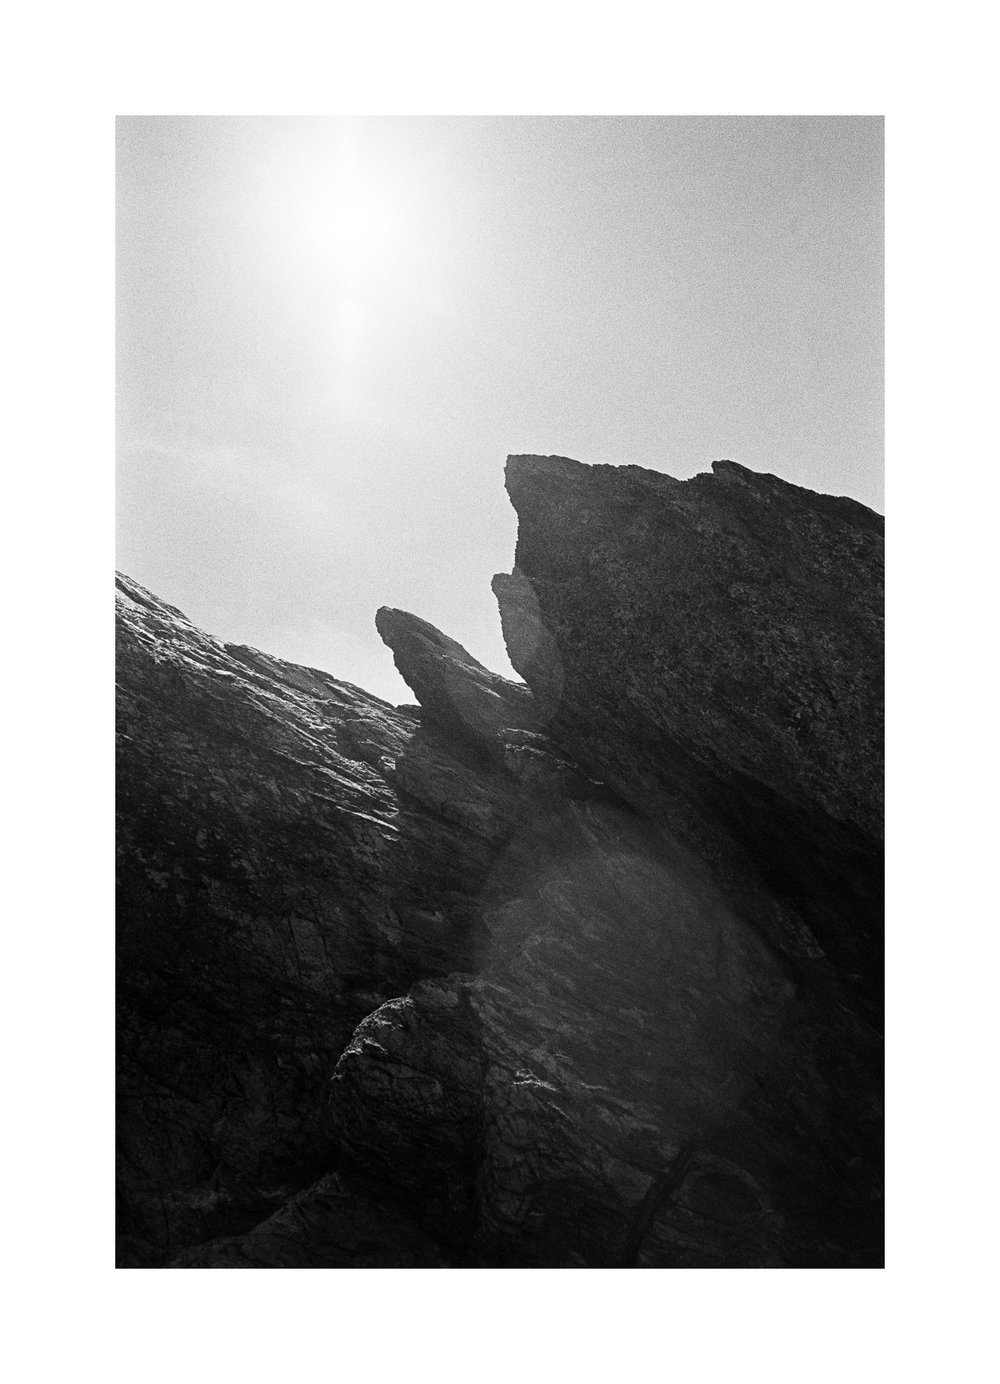 20181103 - Roll 263 - 024-Nick-Bedford,-Photographer-Black and White, Currumbin Rocks, Kodak TRI-X 400, Leica M7, Seascape, Voigtlander 35mm F1.7.jpg